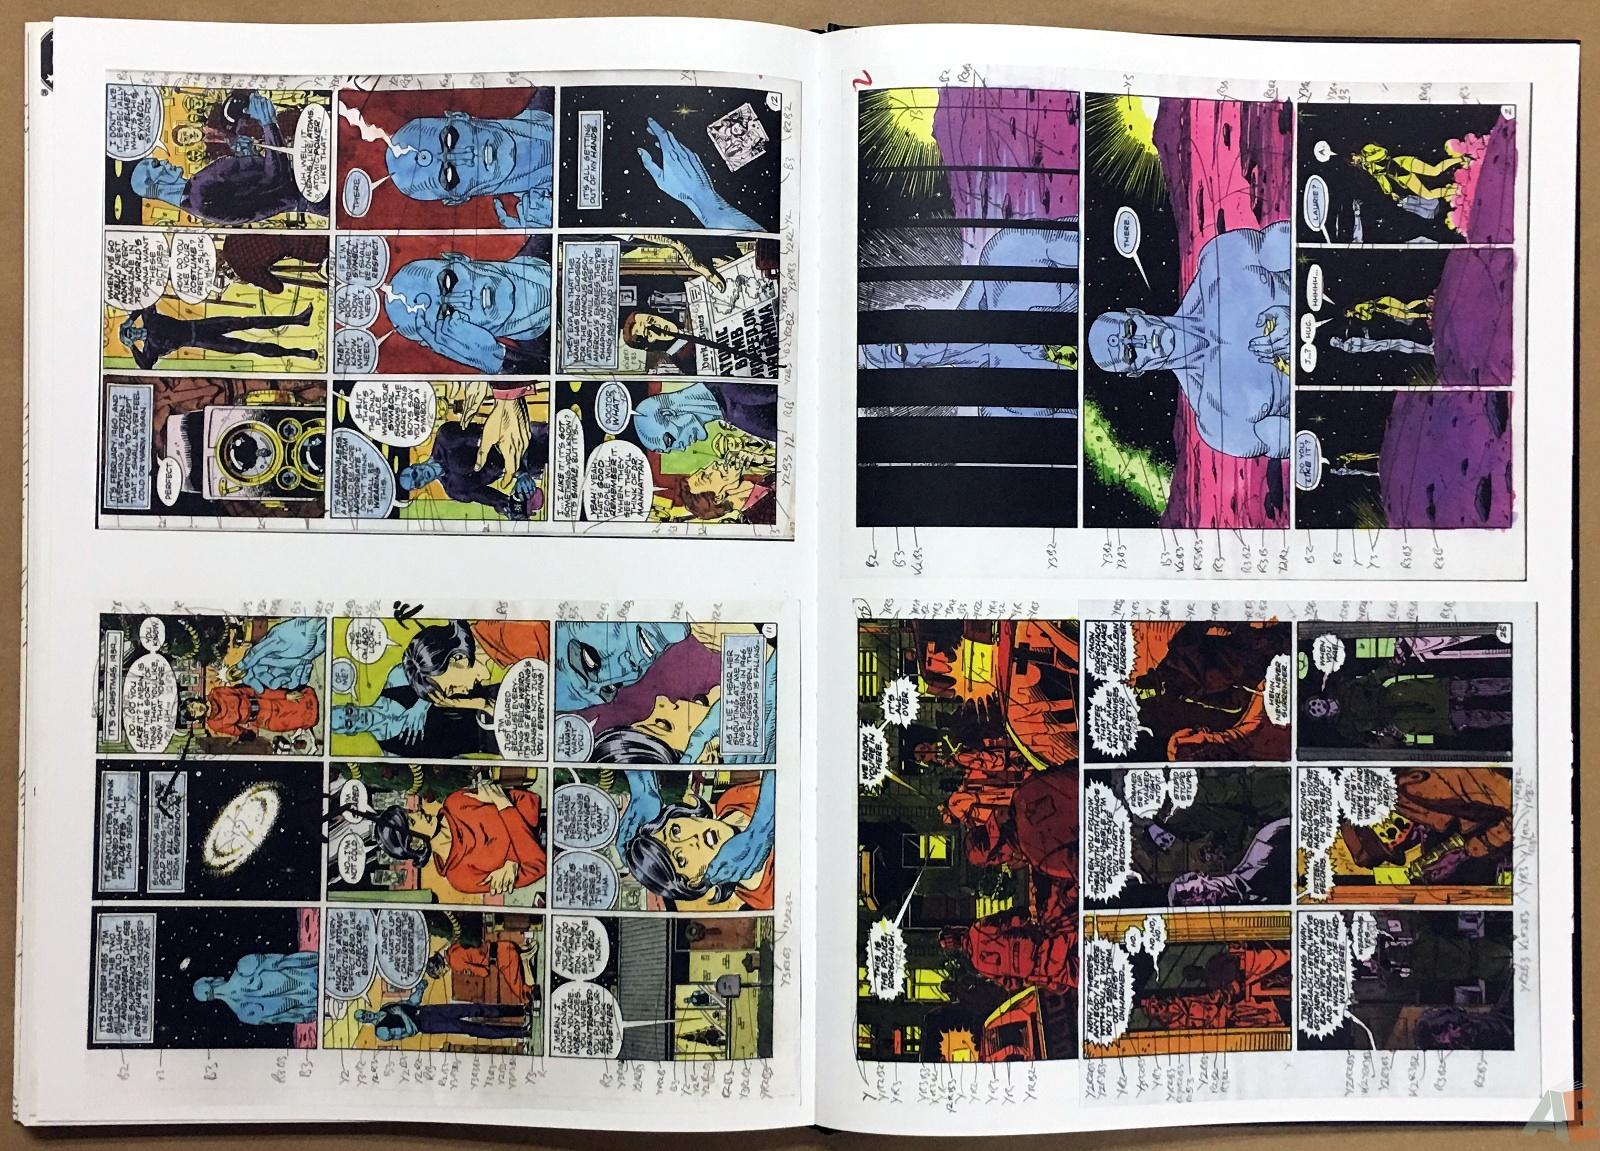 Dave Gibbons Watchmen Artifact Edition 44